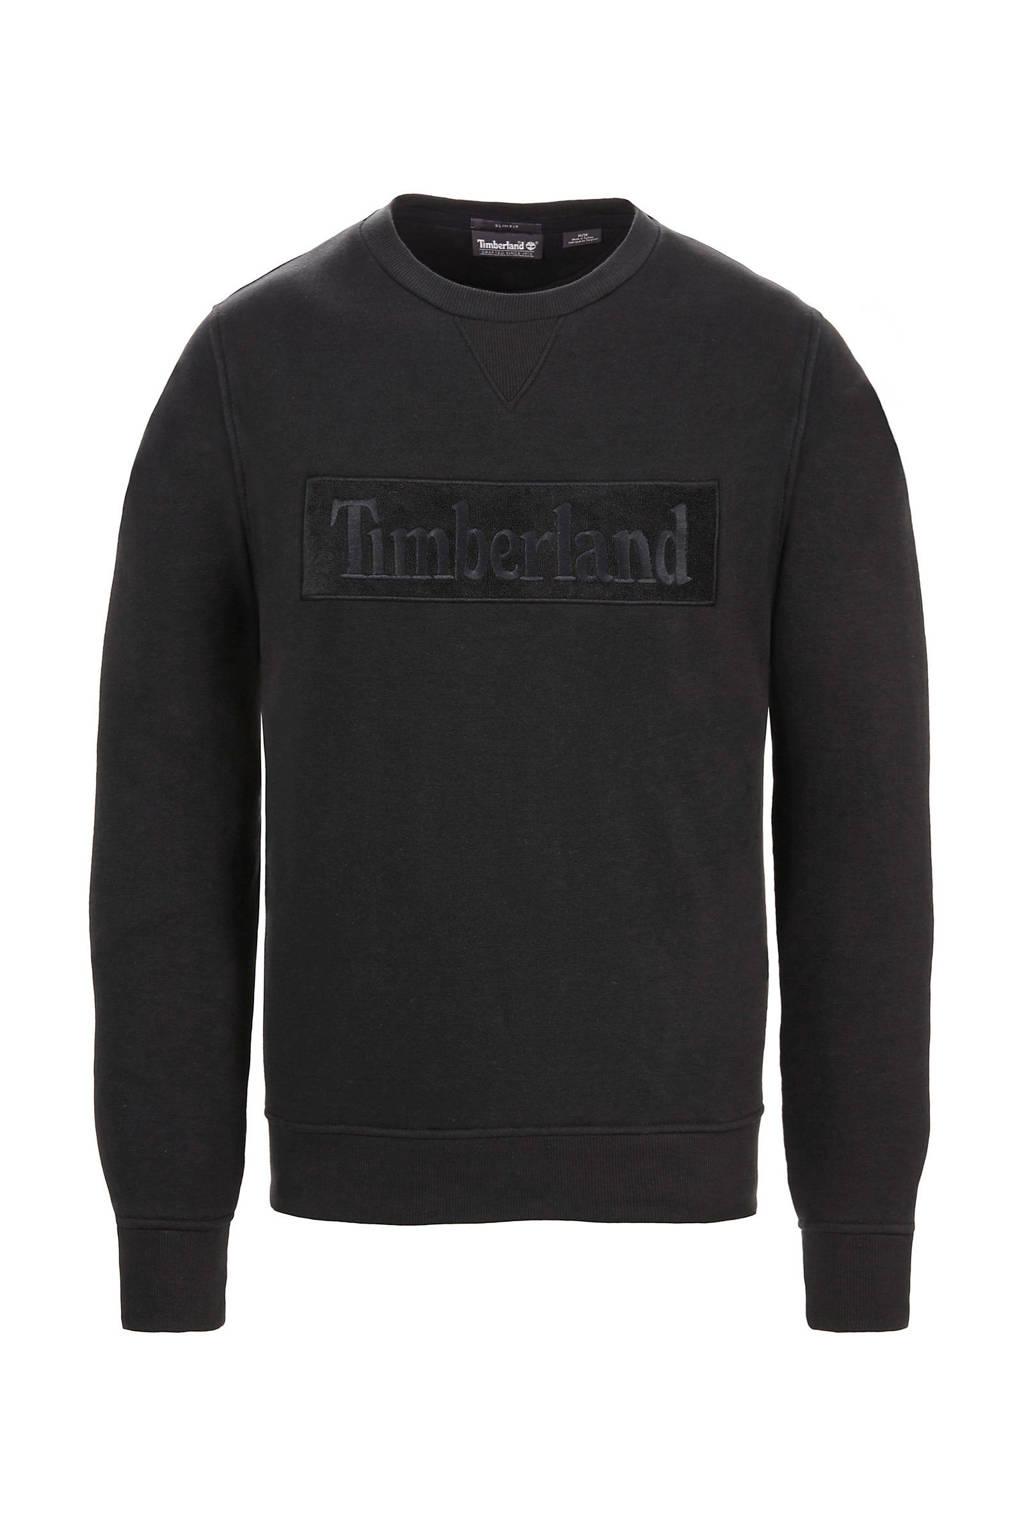 Timberland sweater met logo zwart, Zwart